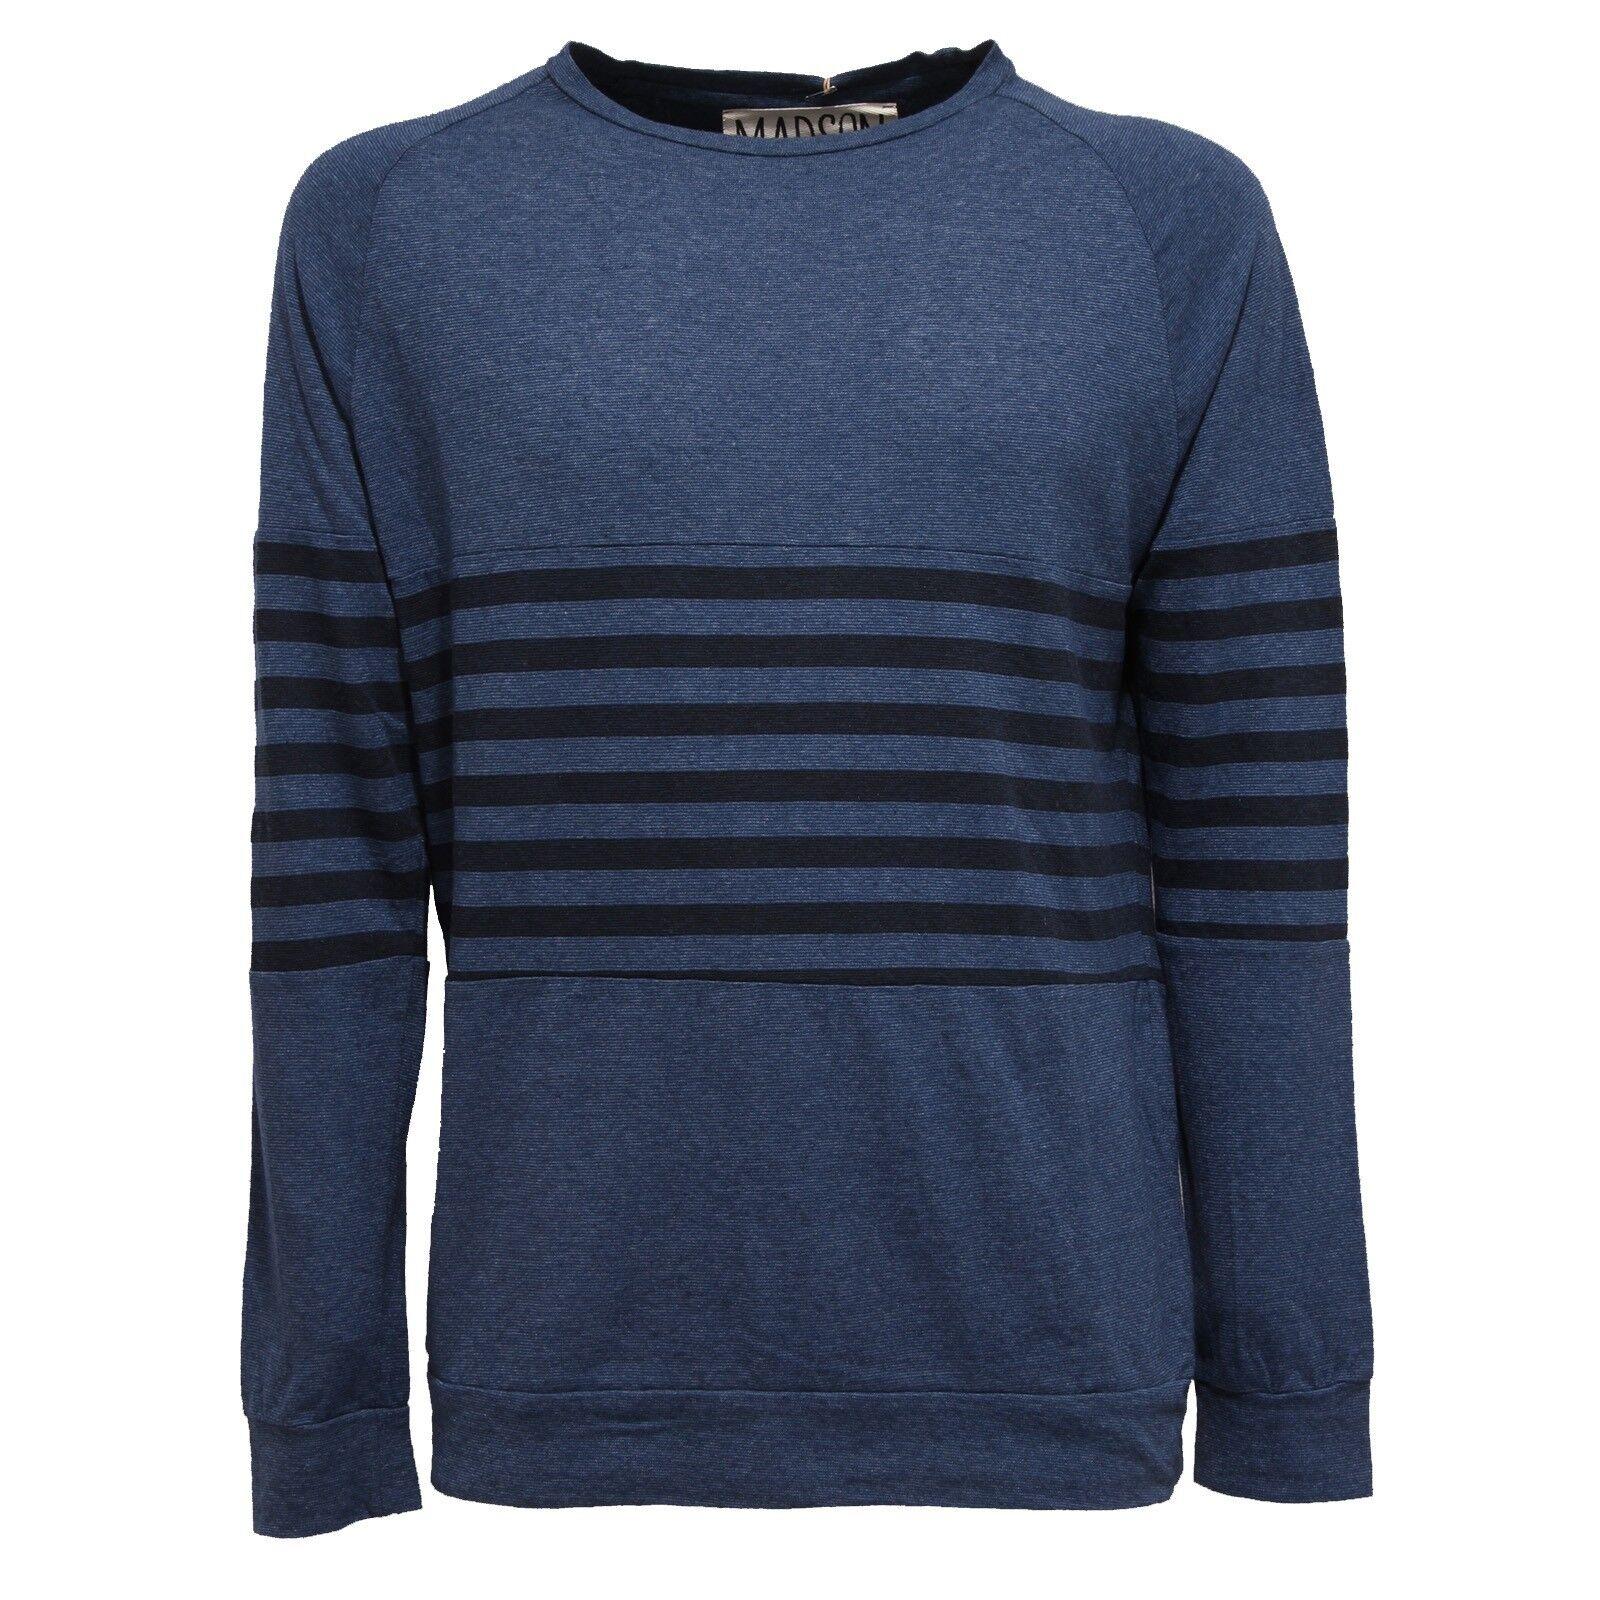 9291S felpa uomo MADSON blu maglia cotone lino sweatshirt men